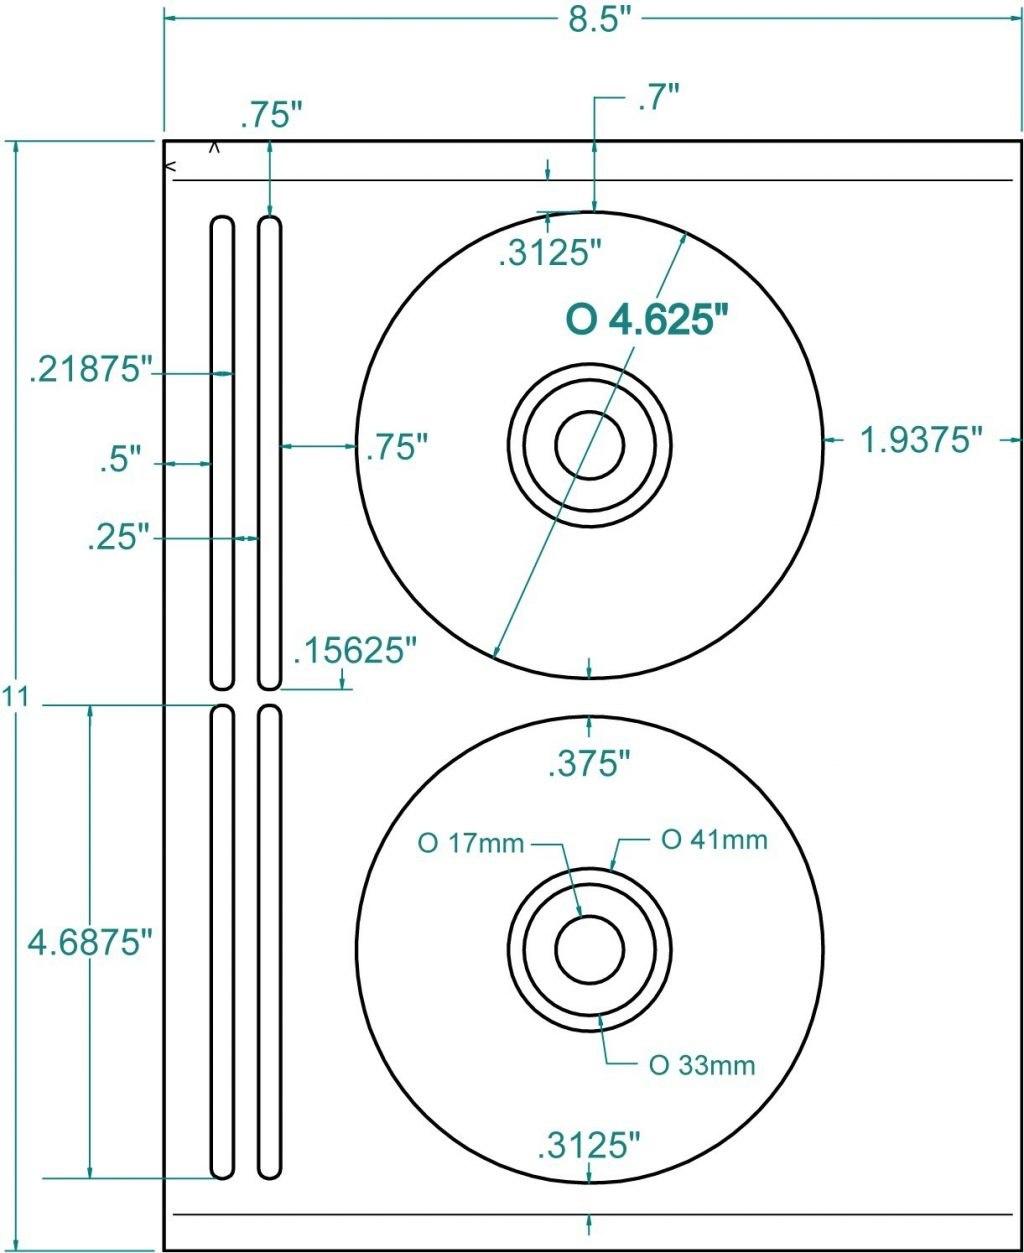 Staples Cd Label Sheet Template  Meetpaulryan Intended For Staples Dvd Label Template